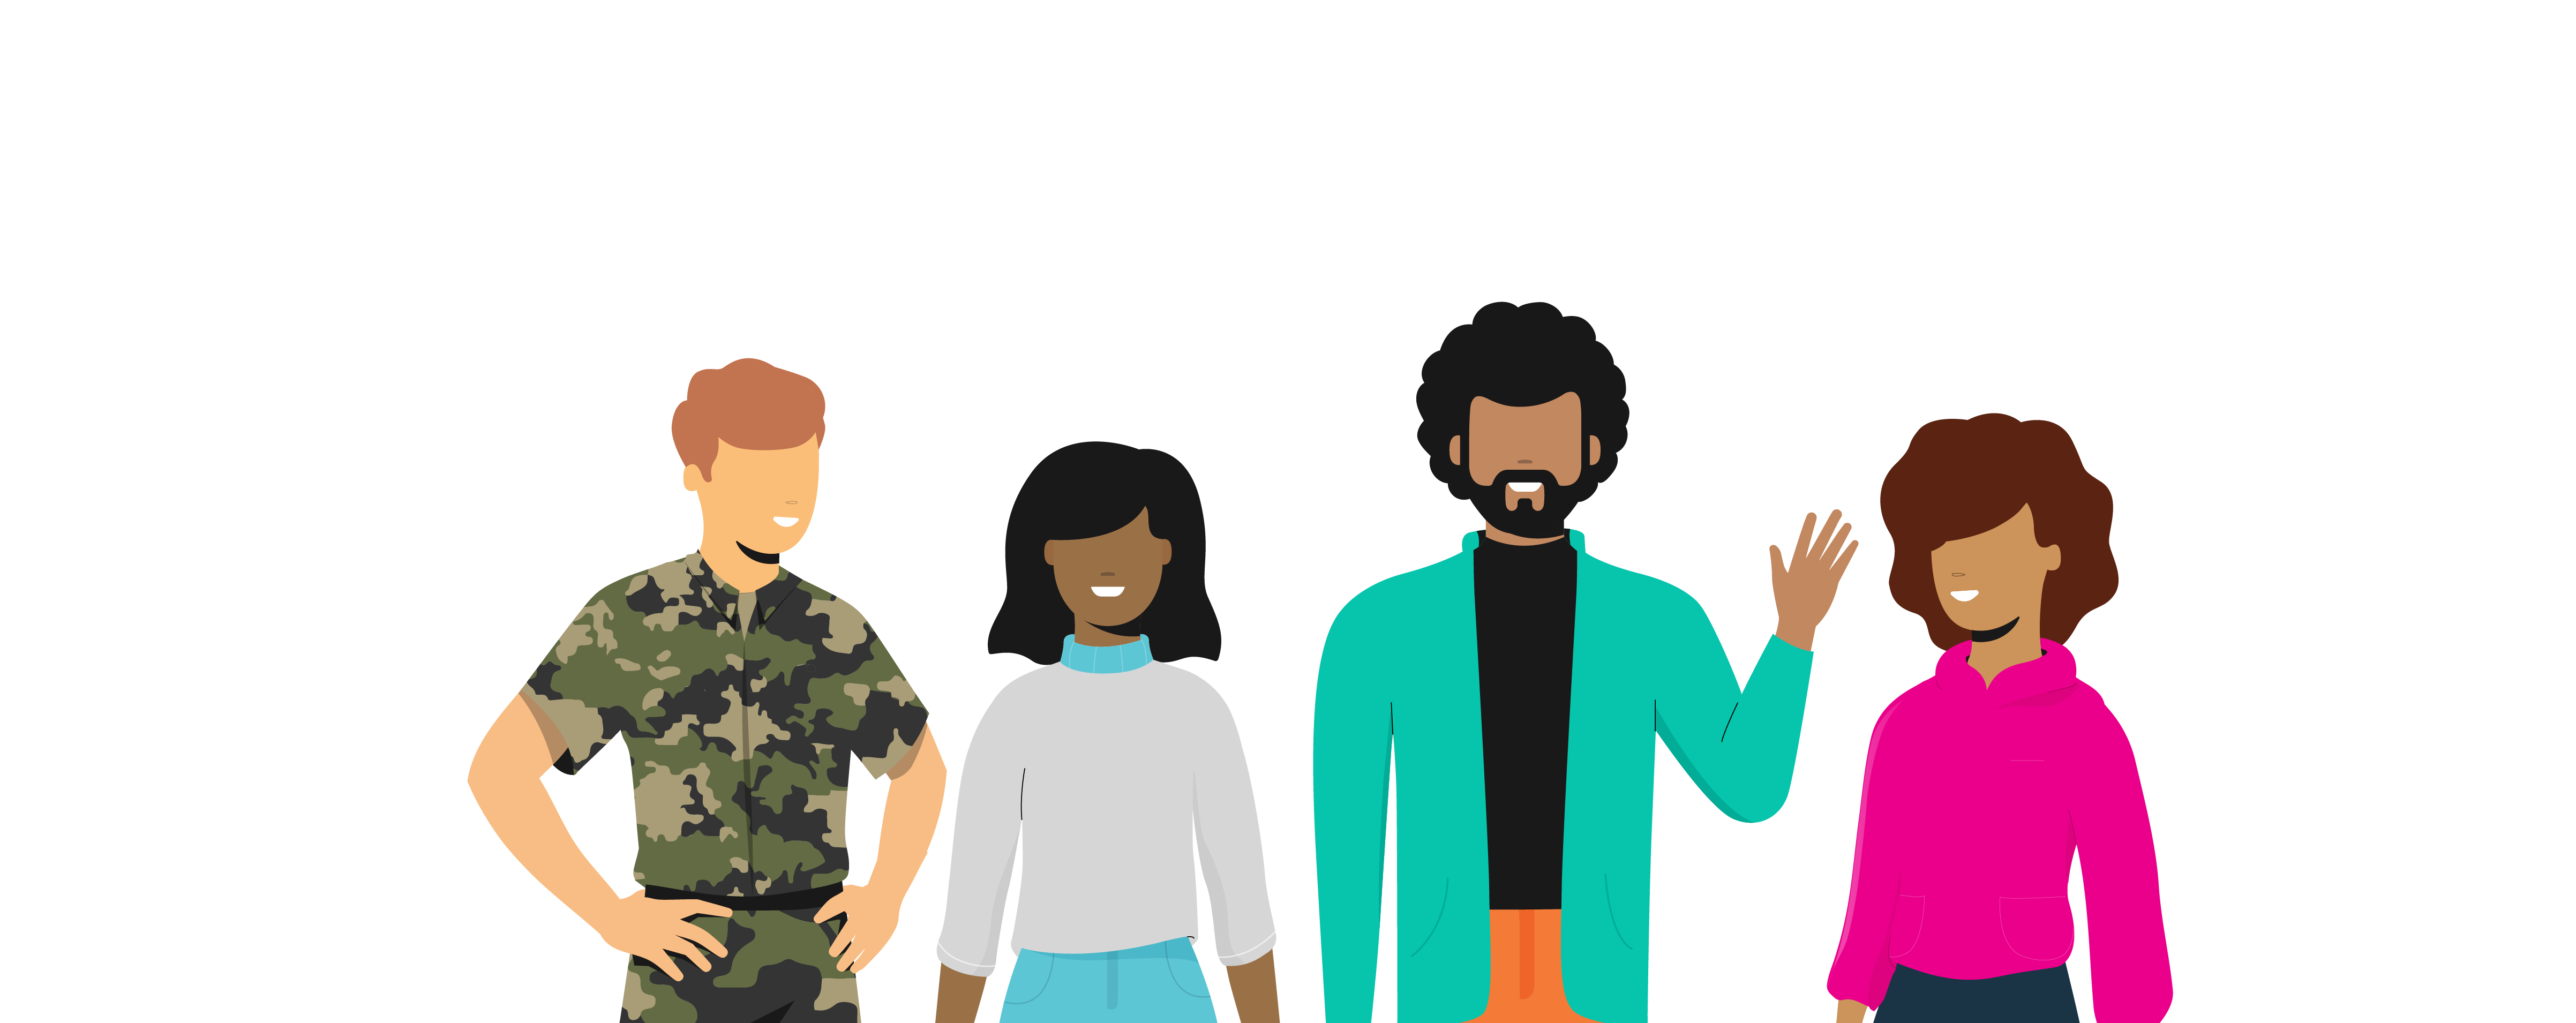 Access Group Illustration